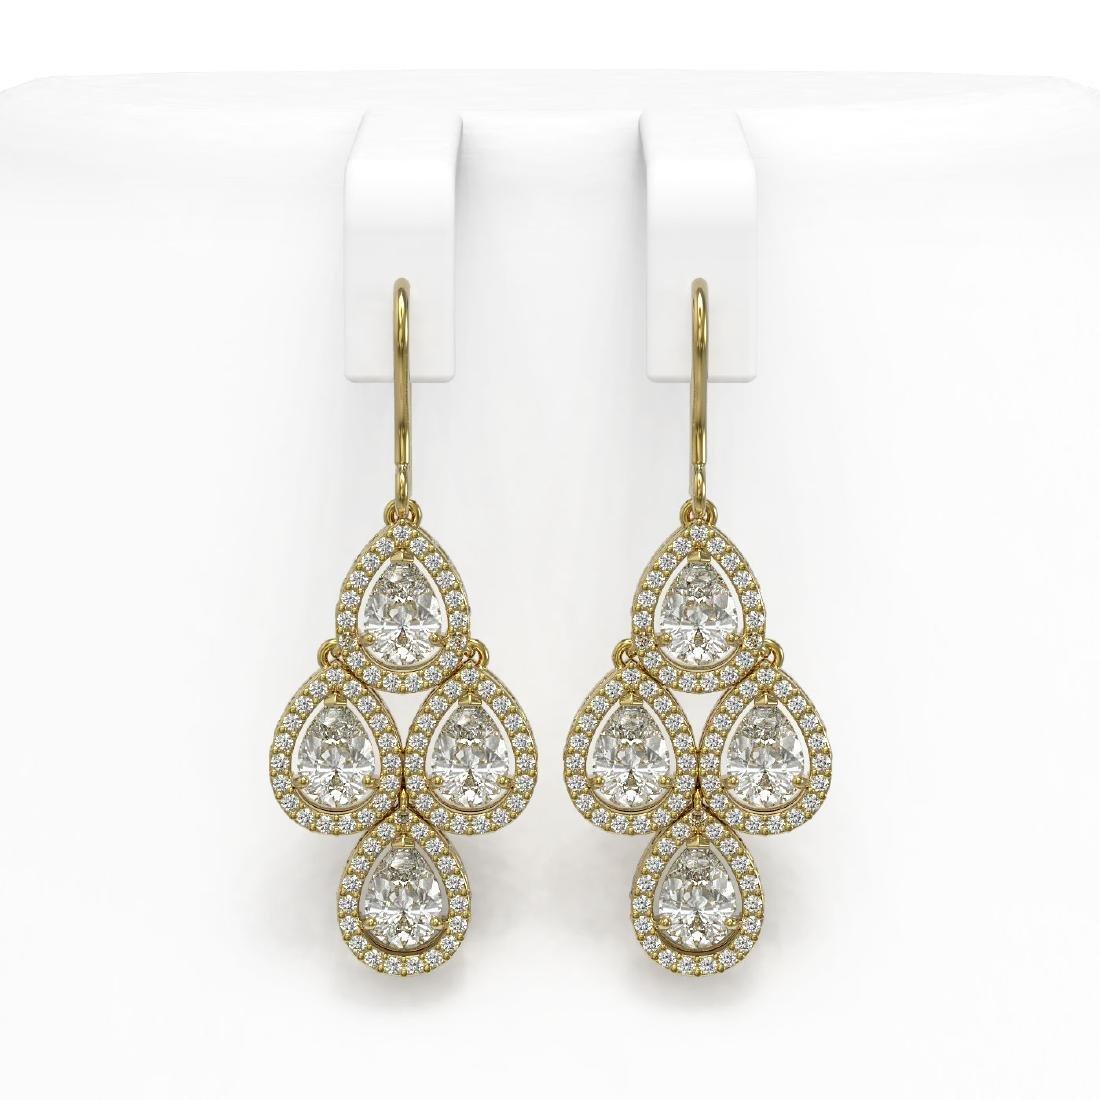 5.85 CTW Pear Diamond Designer Earrings 18K Yellow Gold